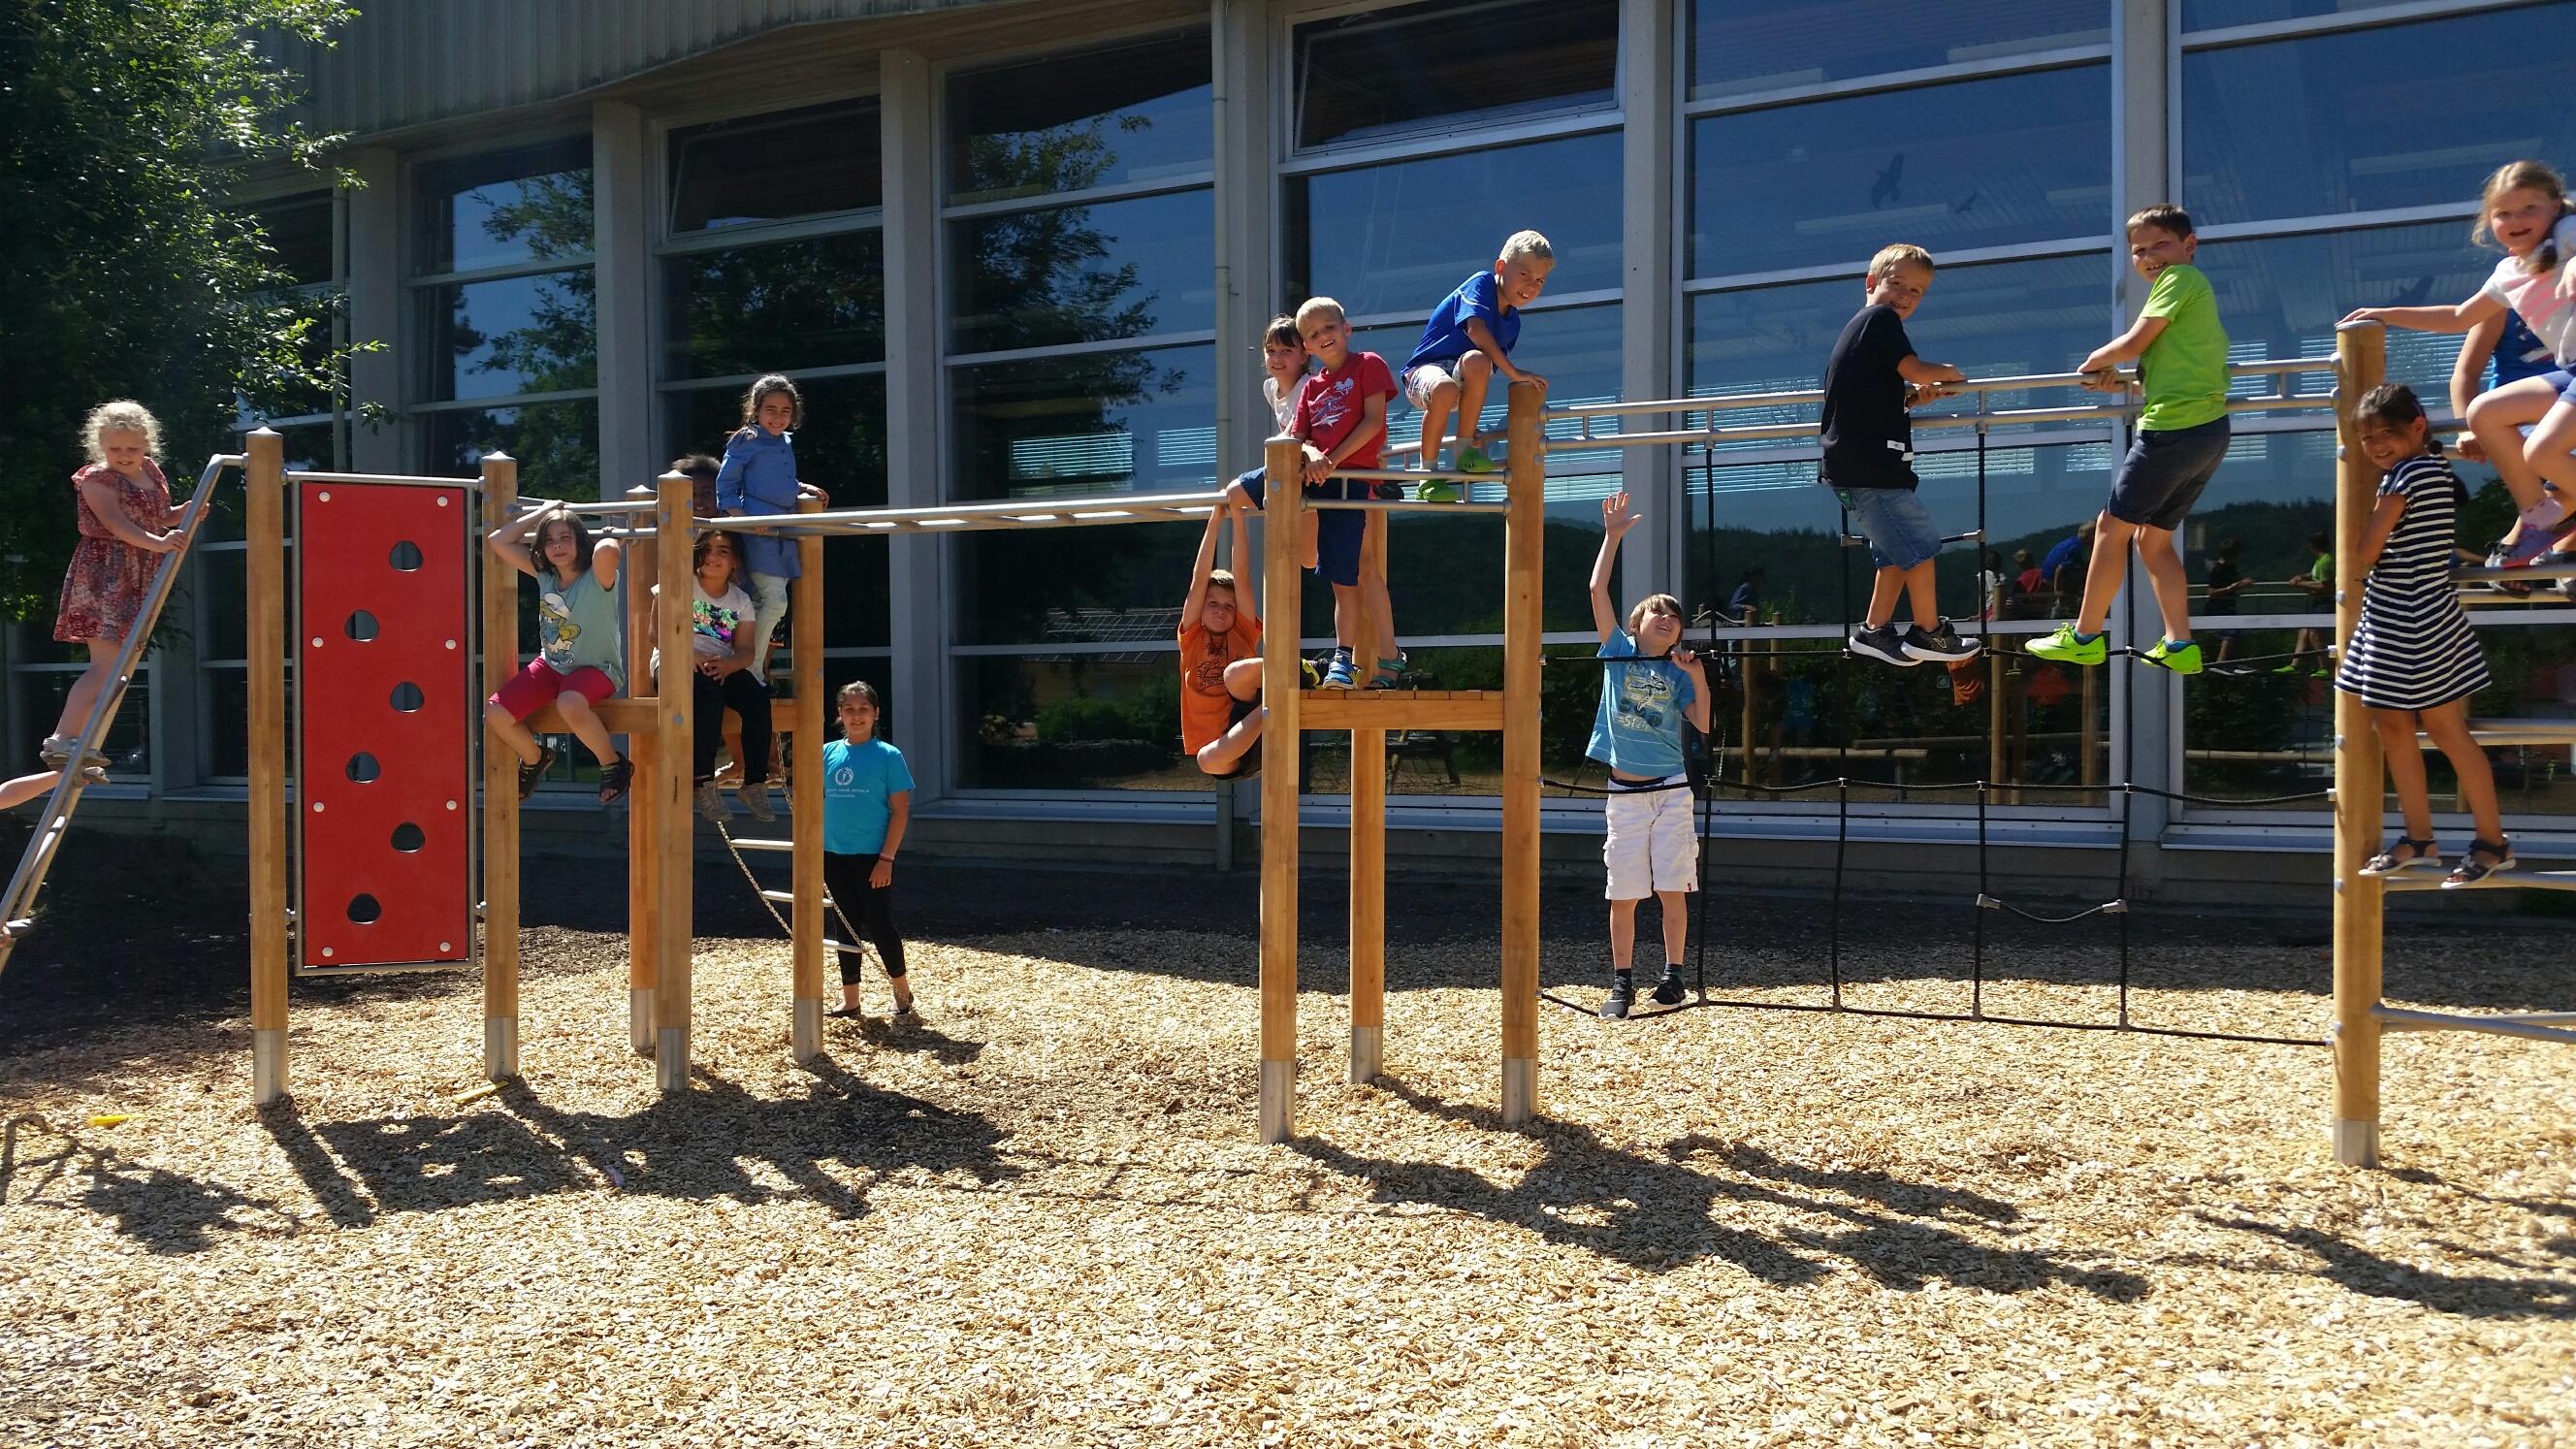 Klettergerüst Schule : Neues klettergerüst auf dem pausenhof friedrich heuss schule